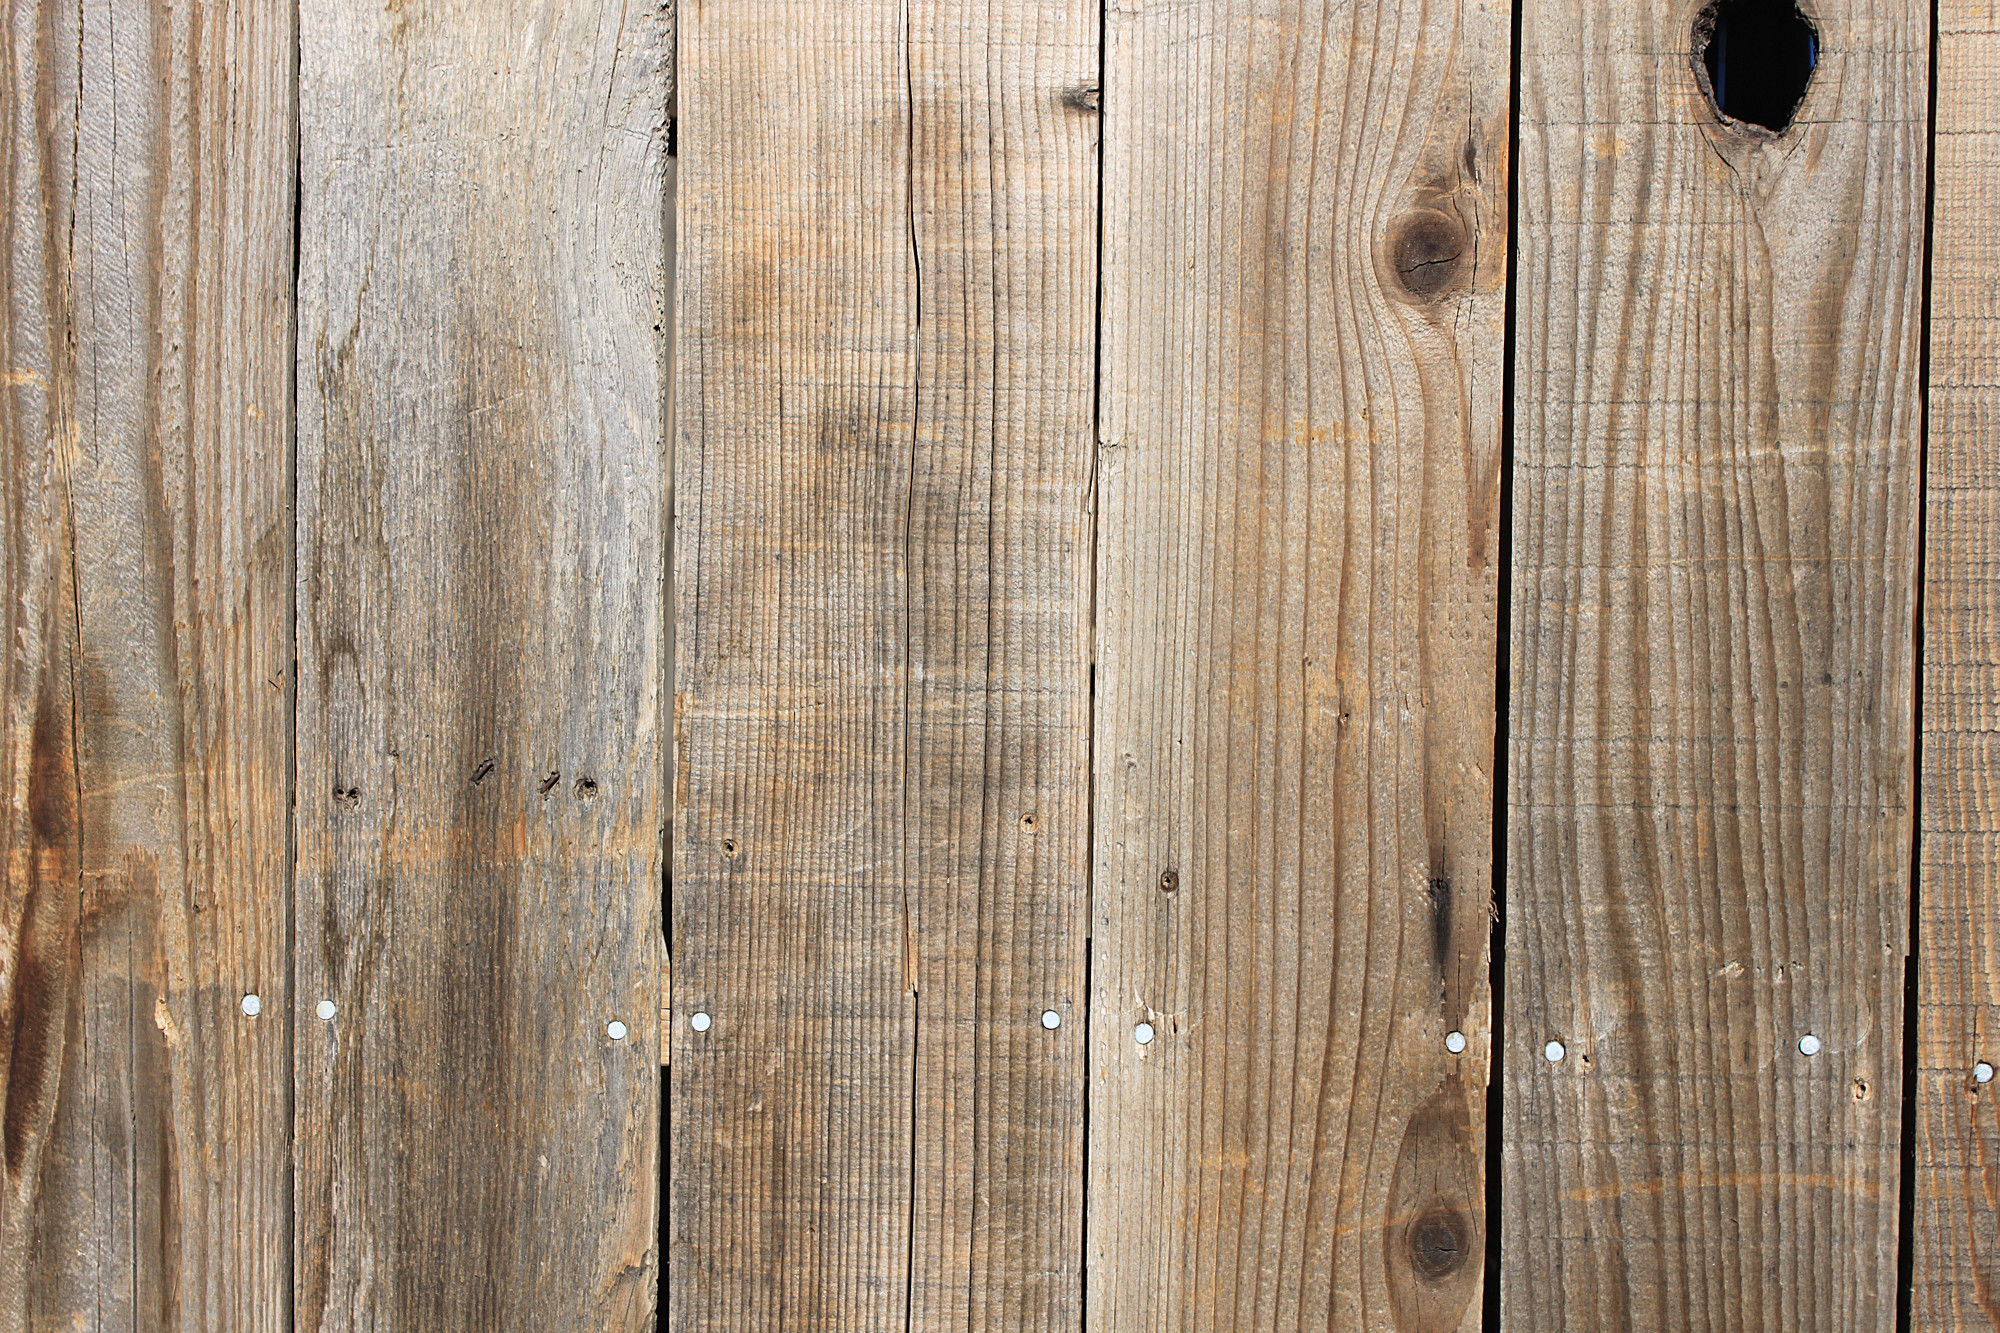 Barn Wood Desktop Wallpaper 41 Images